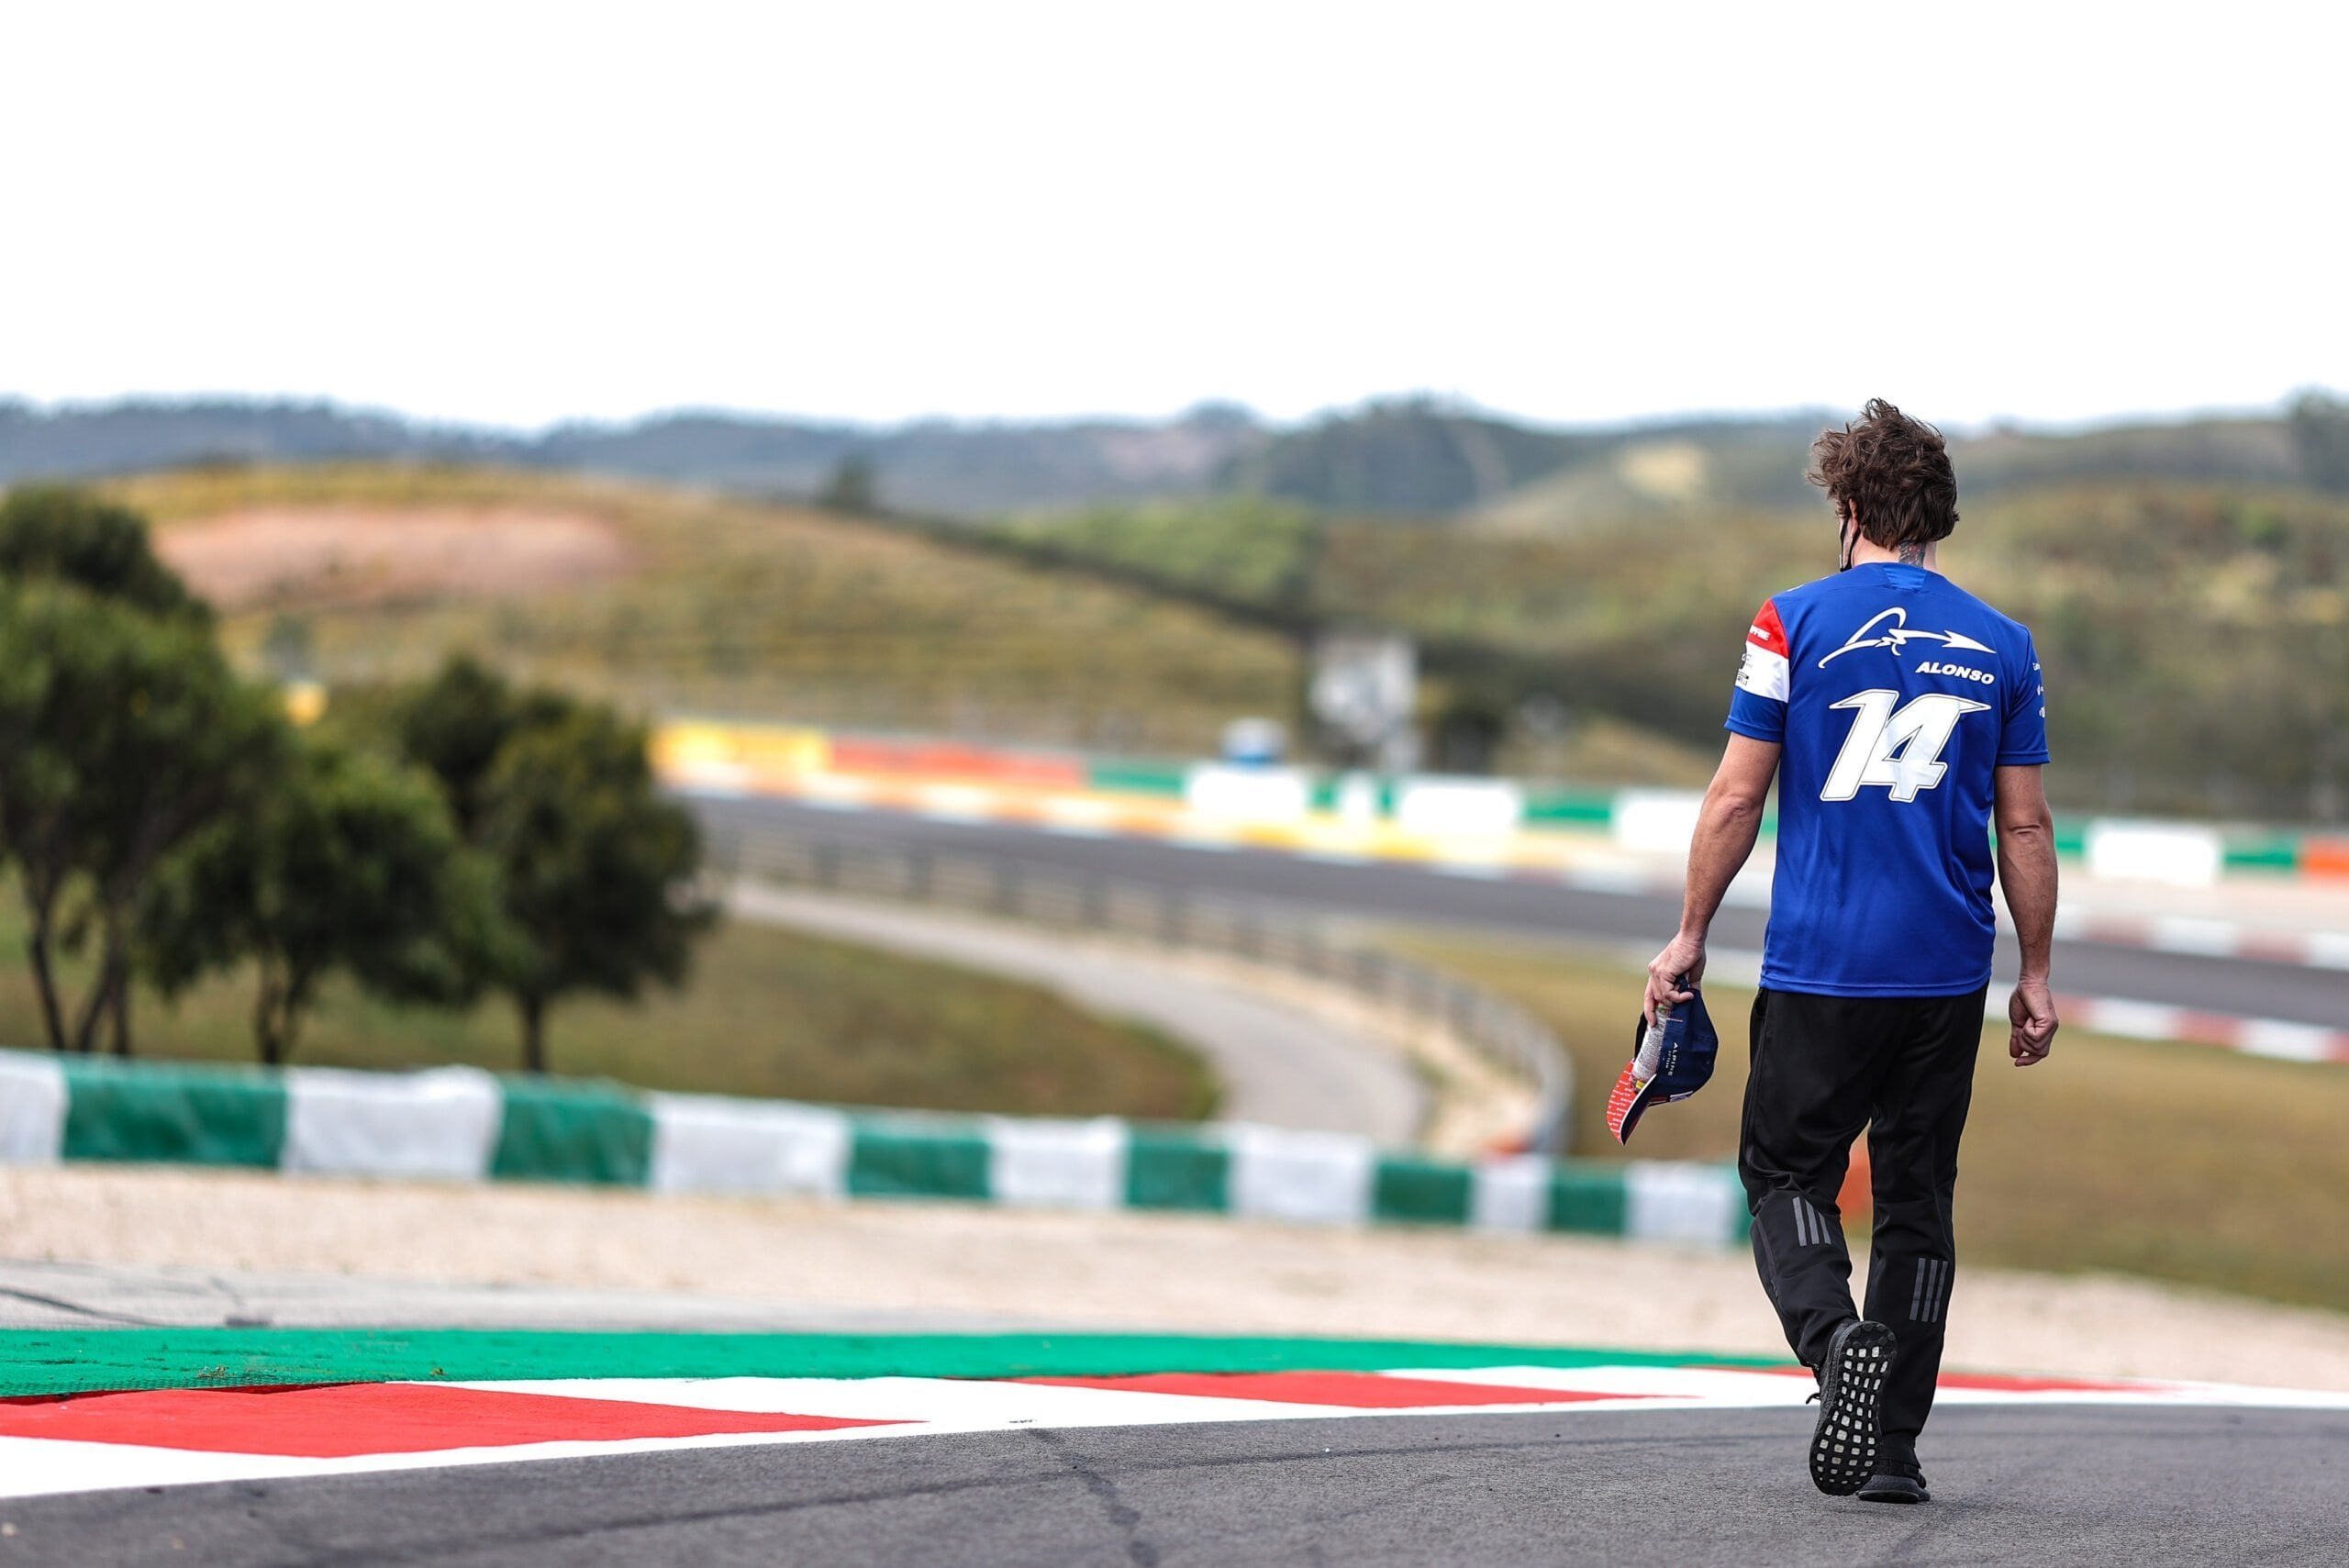 Alpine F1 Team alonso ocon Grand Prix Heineken du Portugal Formule 1 20215 scaled | Alpine F1 Team : Grand Prix Heineken du Portugal de Formule 1 2021